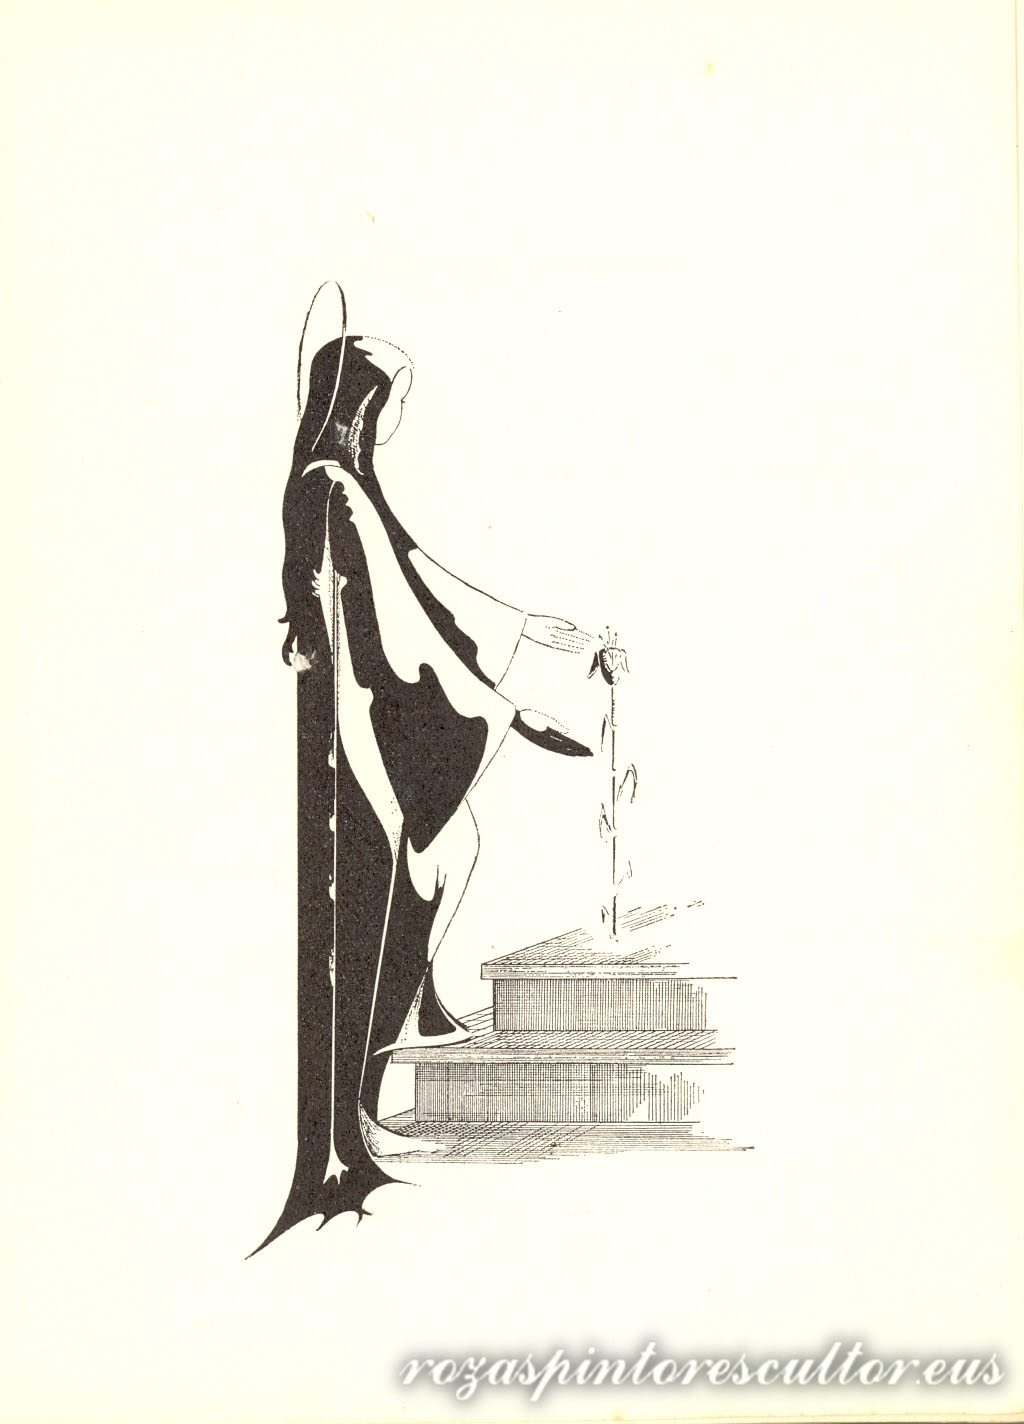 1966 Marian Misterioak 16